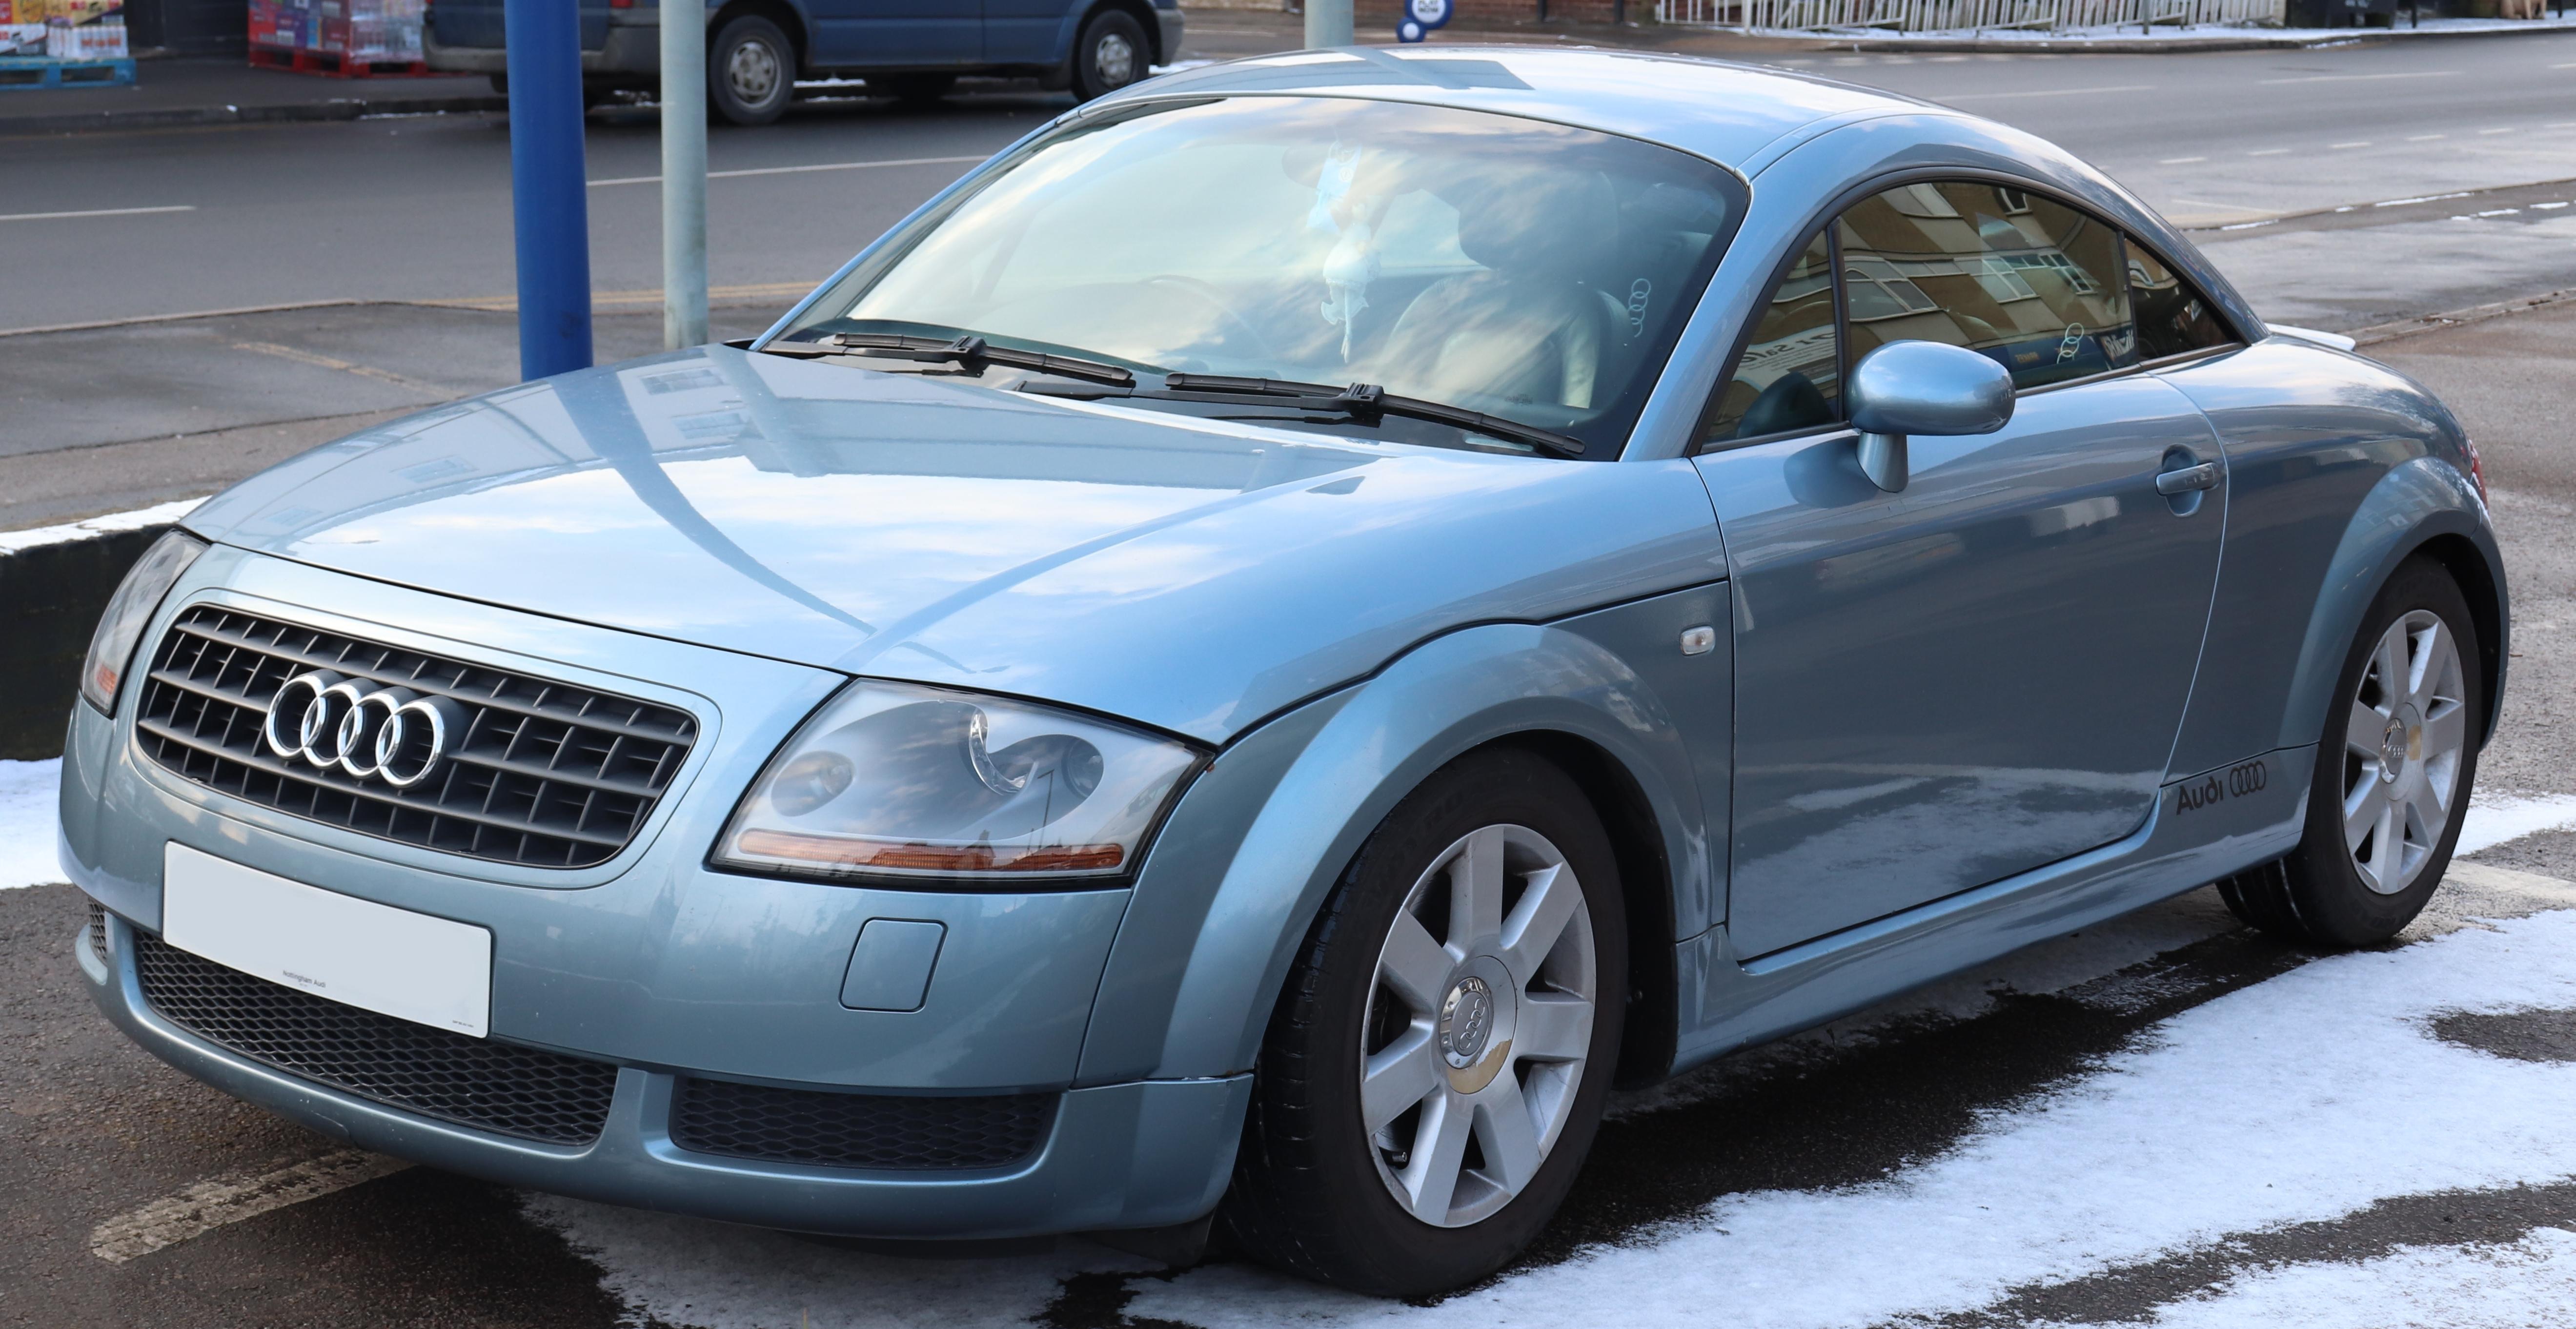 Kekurangan Audi Tt 2005 Murah Berkualitas